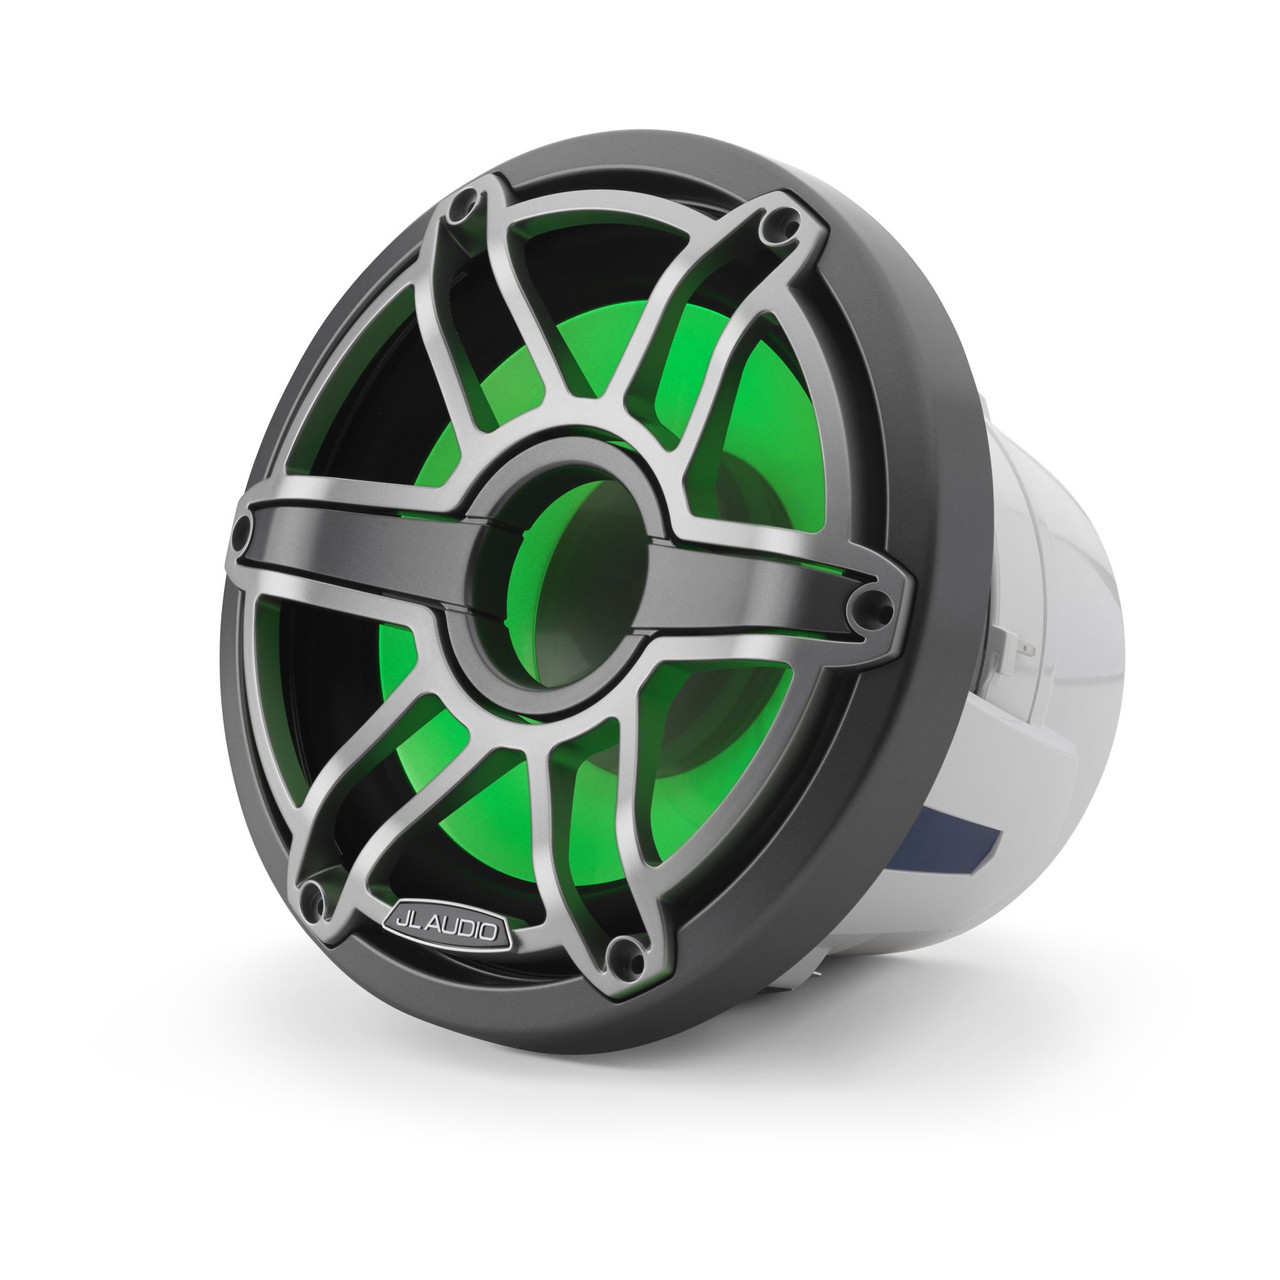 JL Audio 8-Inch M6 Marine Infinite Baffle Subwoofer, RGB LED, Gunmetal &  Titanium, Sport Grille - SKU: M6-8IB-S-GmTi-i-4